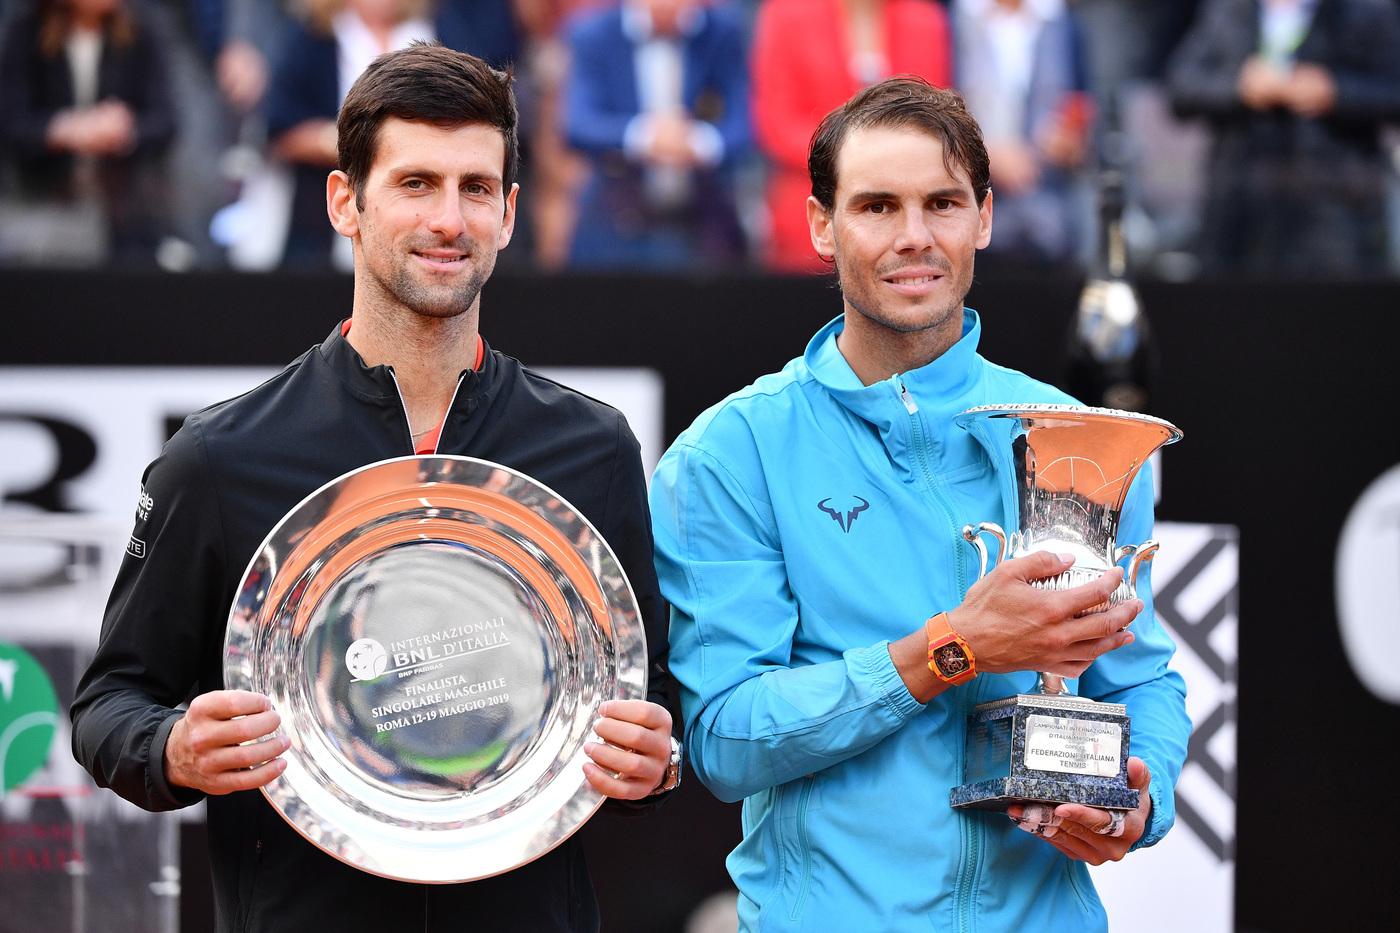 Pronostici tennis live oggi finale Djokovic-Nadal ATP Masters 1000 Roma Internazionali BNL d'Italia WTA fianle Swiatek-Pliskova domenica 16 maggio 2021